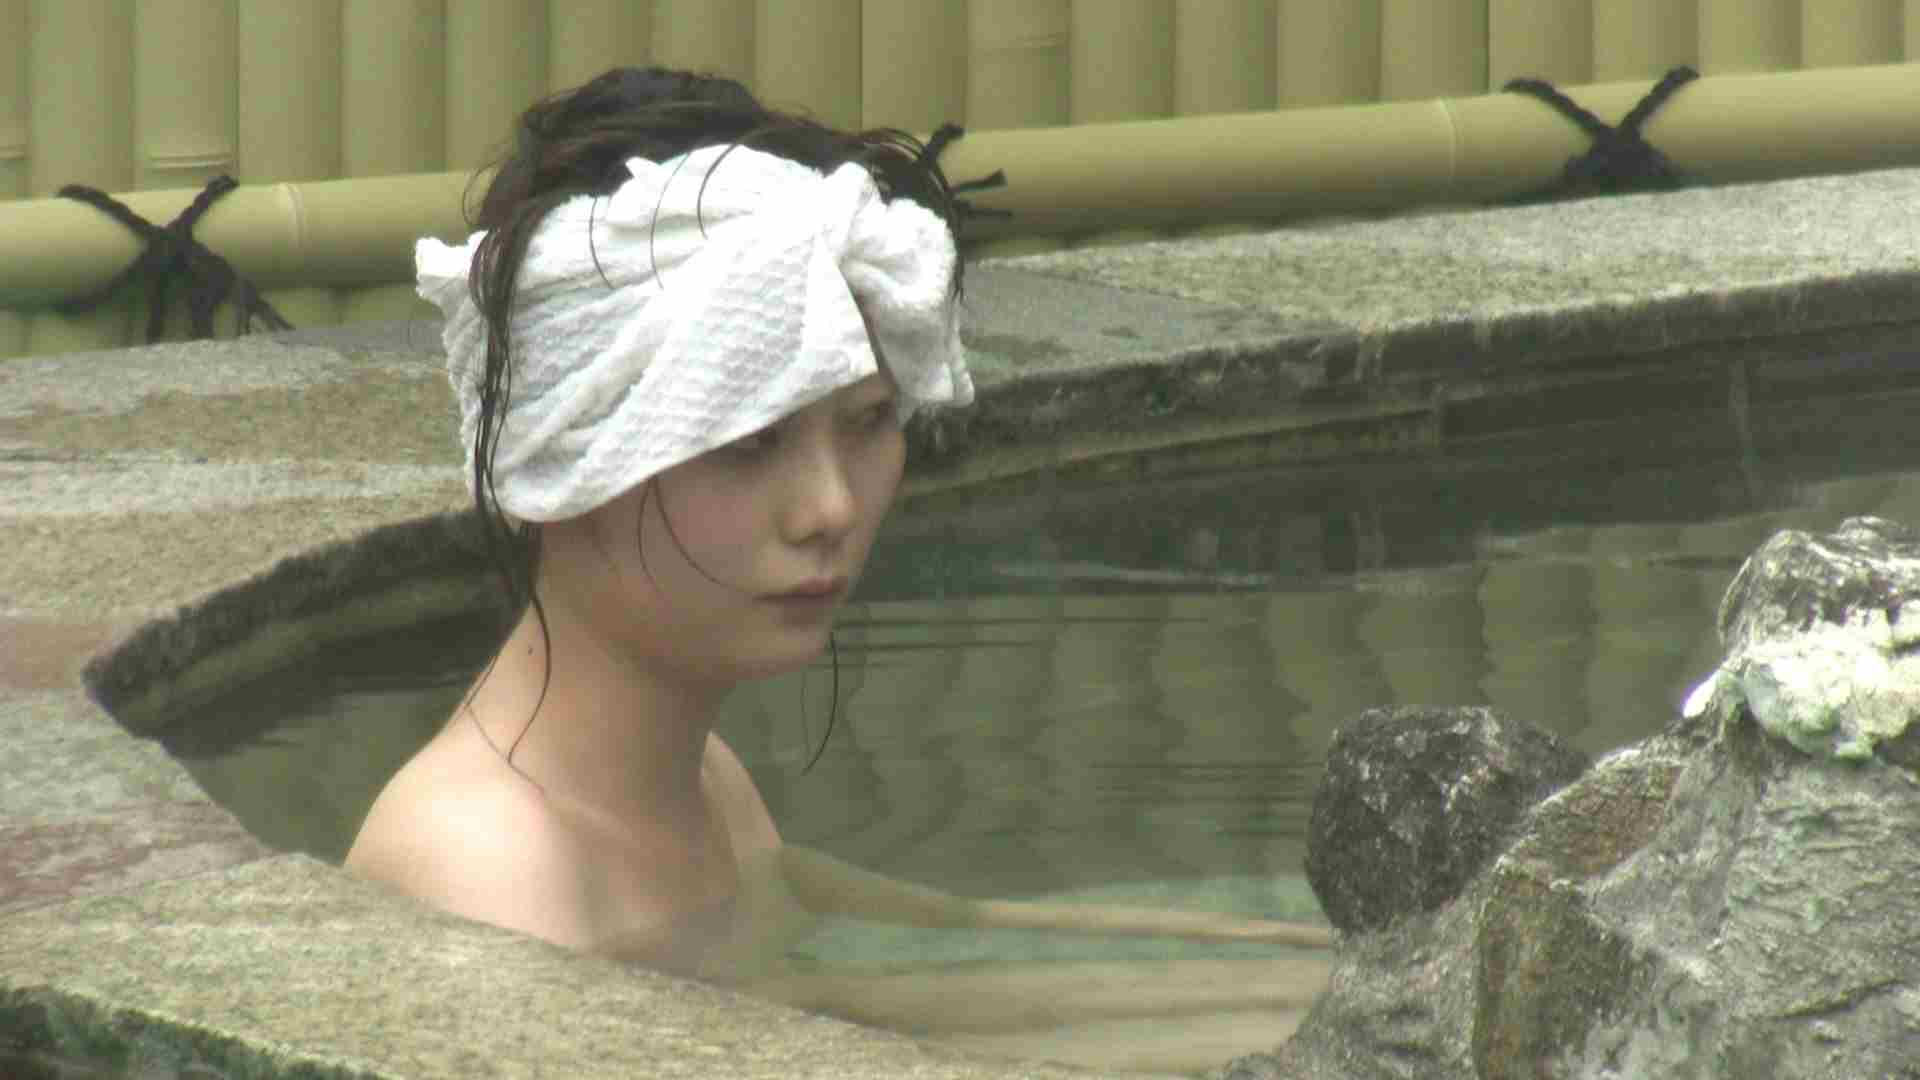 Aquaな露天風呂Vol.147 盗撮 | OLセックス  85画像 52